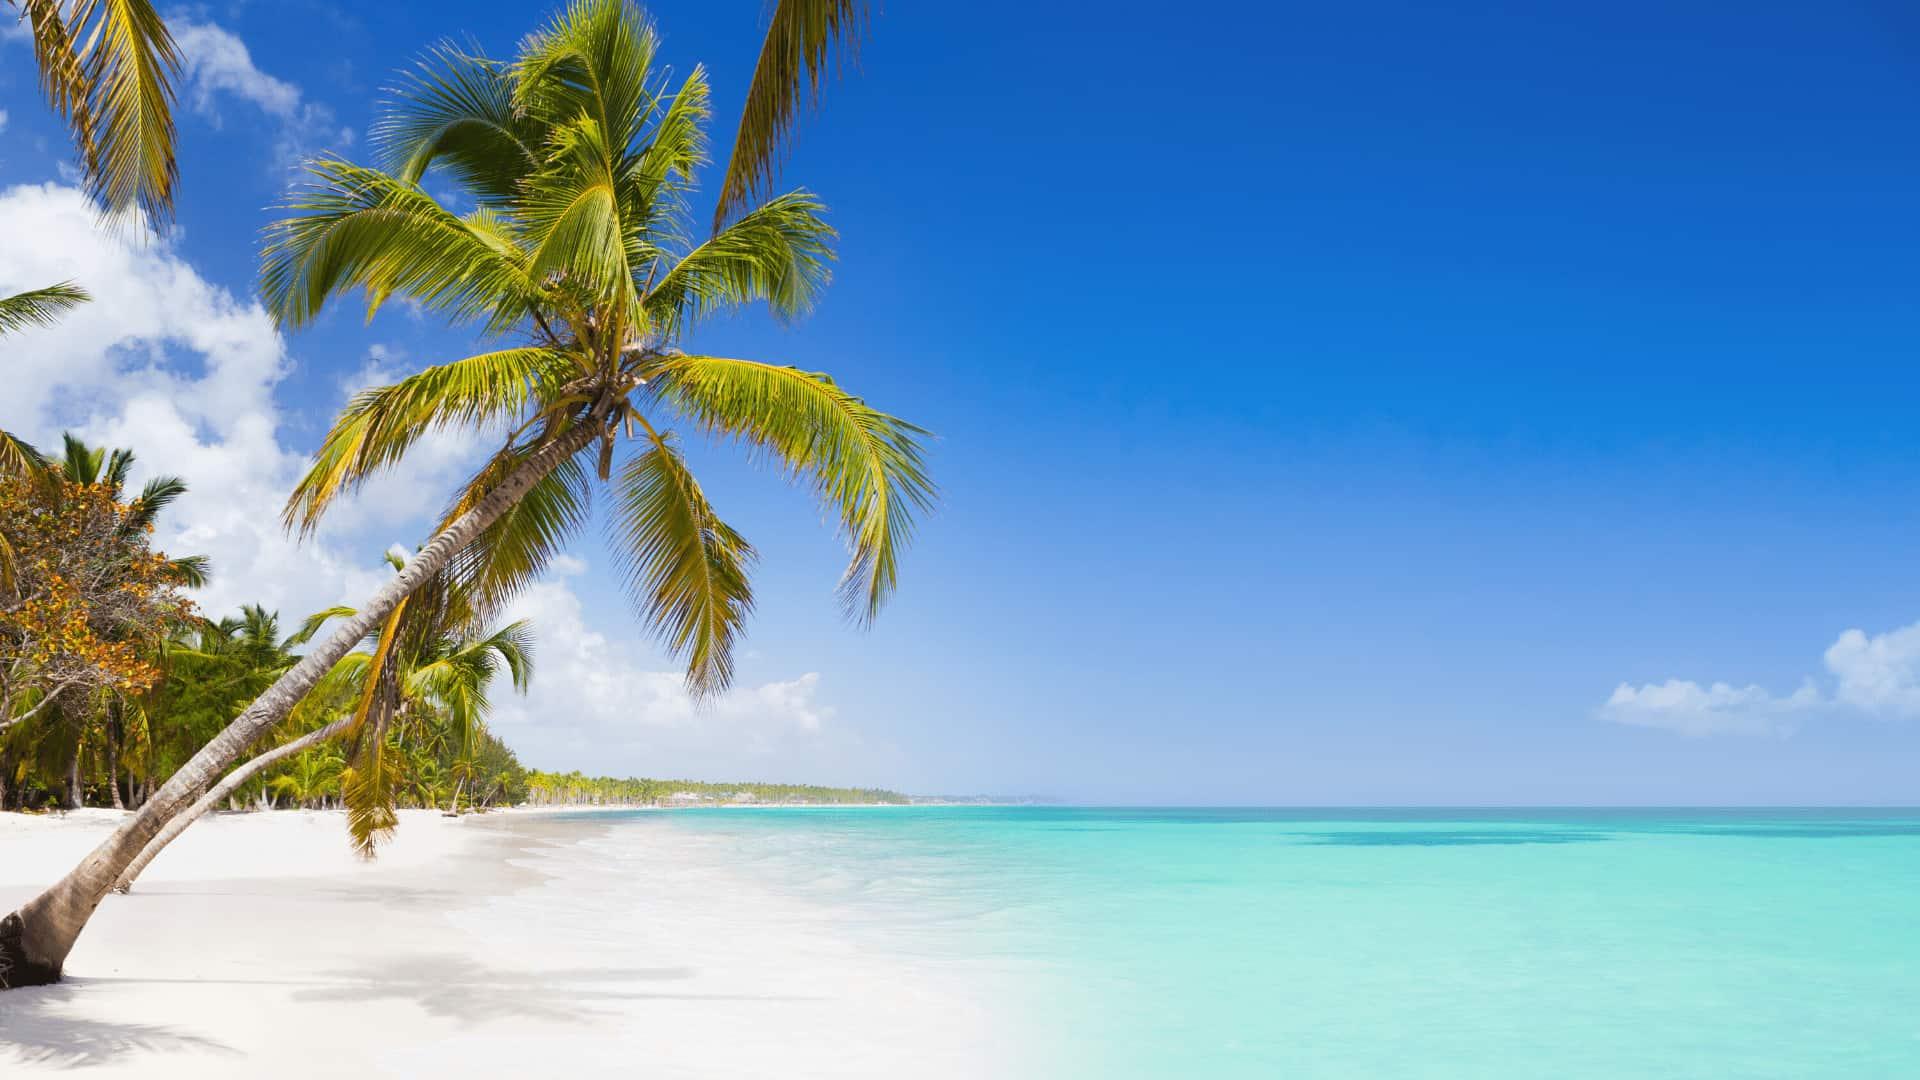 Punta Cana Accesible. Destinos accesibles